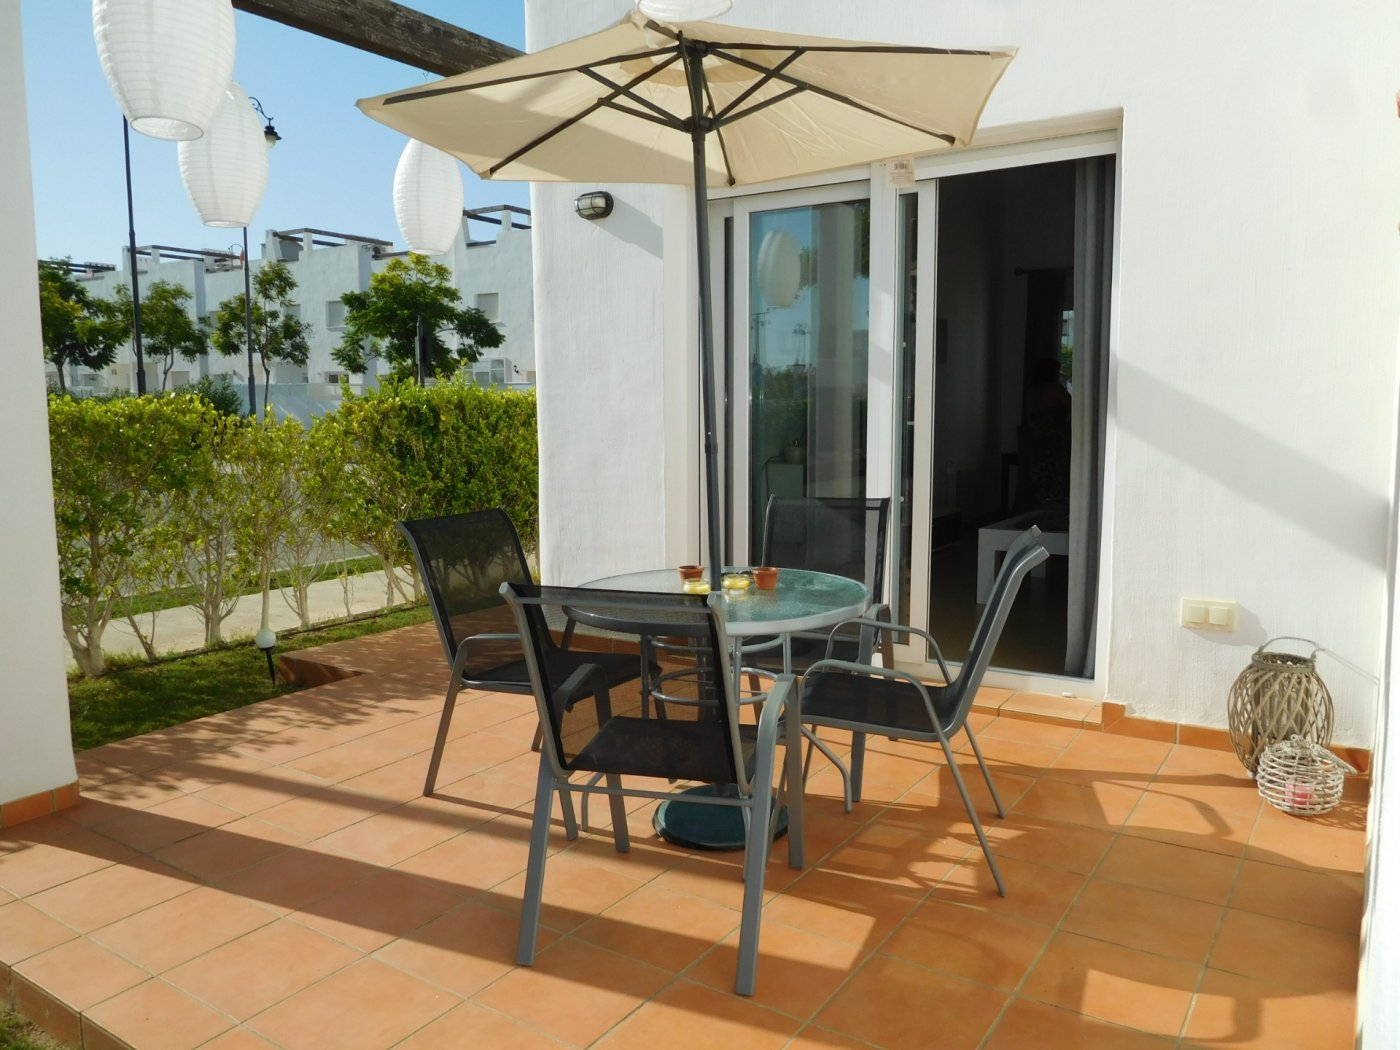 Propery For Sale in Alhama de Murcia, Spain image 0